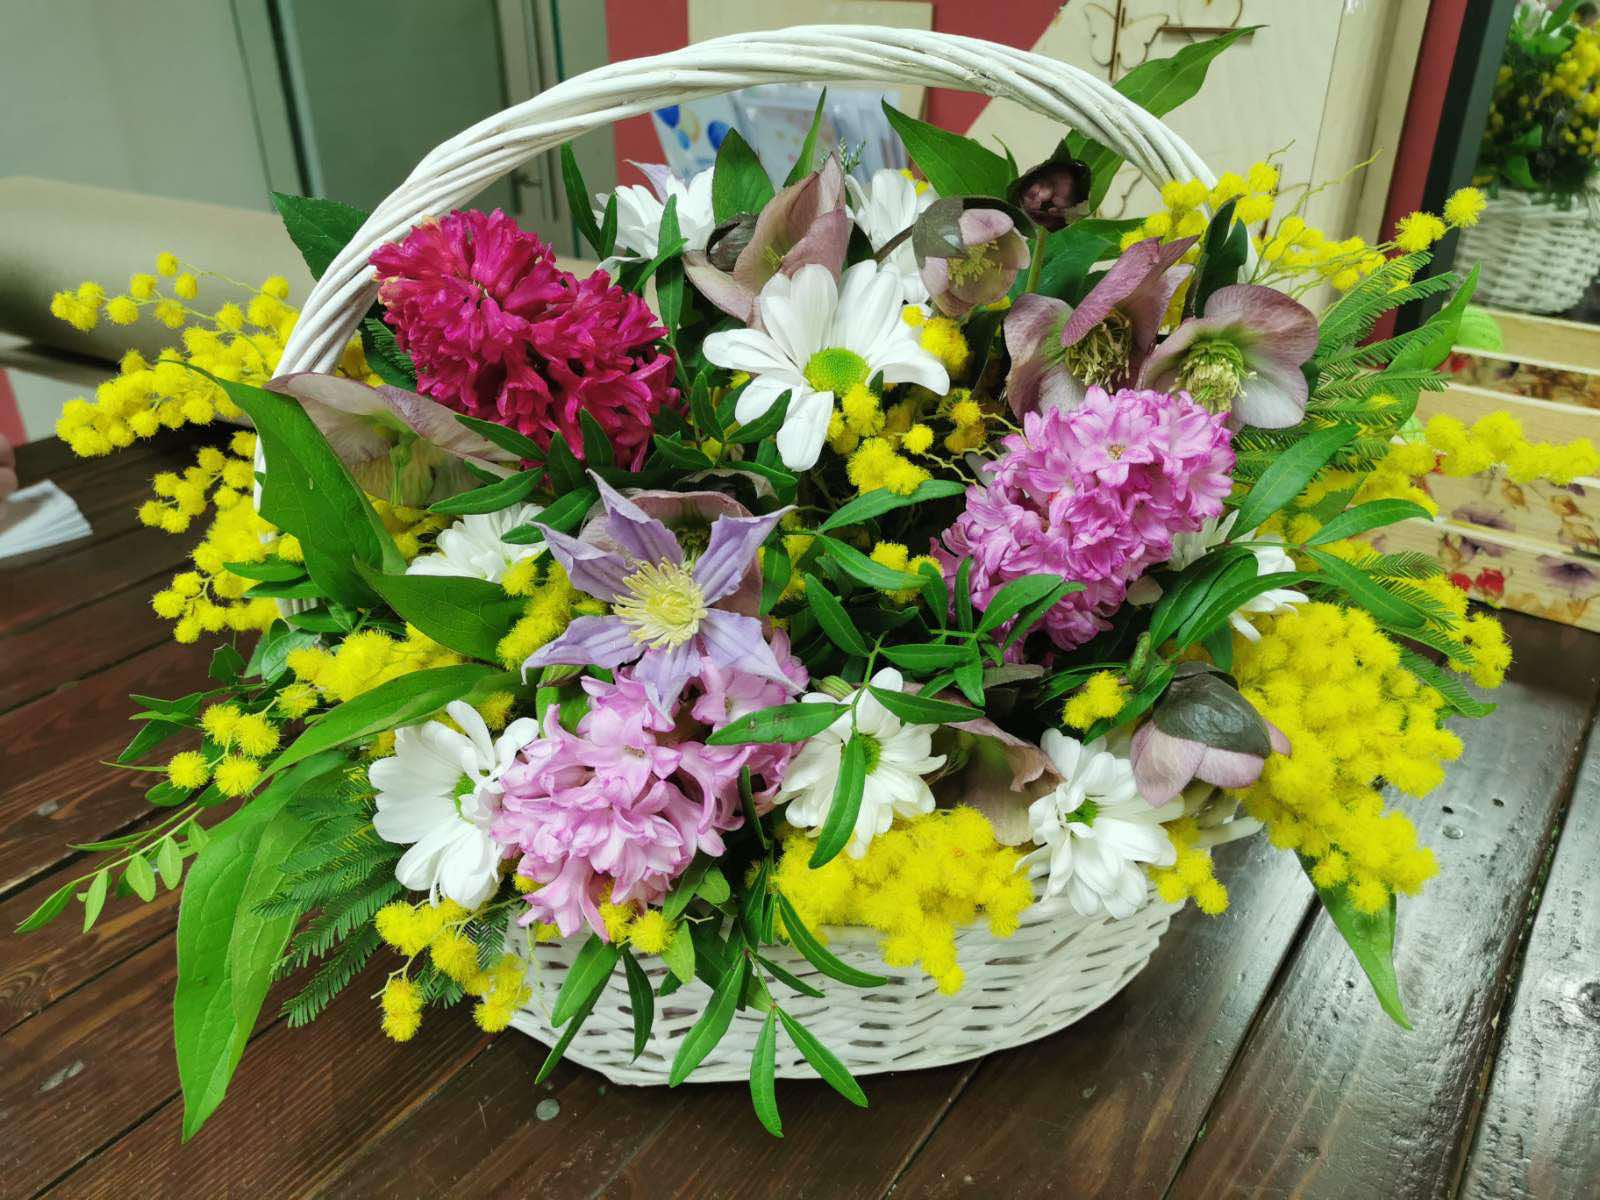 Весенняя корзина с цветами с мимозами